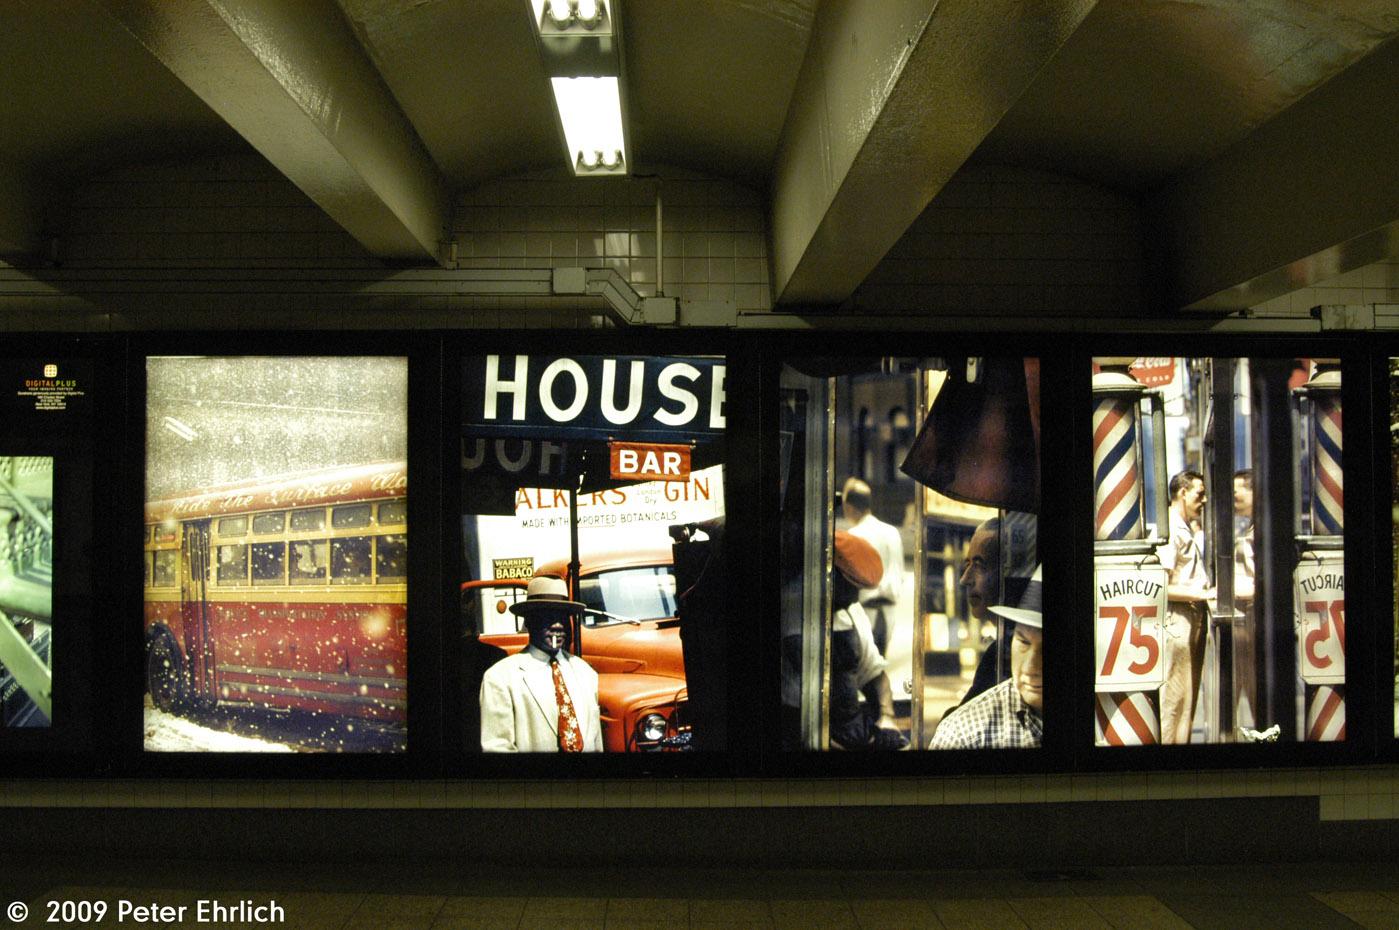 (329k, 1399x930)<br><b>Country:</b> United States<br><b>City:</b> New York<br><b>System:</b> New York City Transit<br><b>Line:</b> IND 6th Avenue Line<br><b>Location:</b> 42nd Street/Bryant Park <br><b>Photo by:</b> Peter Ehrlich<br><b>Date:</b> 7/22/2009<br><b>Artwork:</b> <i>Underground Exposure: Photographs from a Daily Commute</i>, Travis Ruse (2009).<br><b>Viewed (this week/total):</b> 0 / 1187